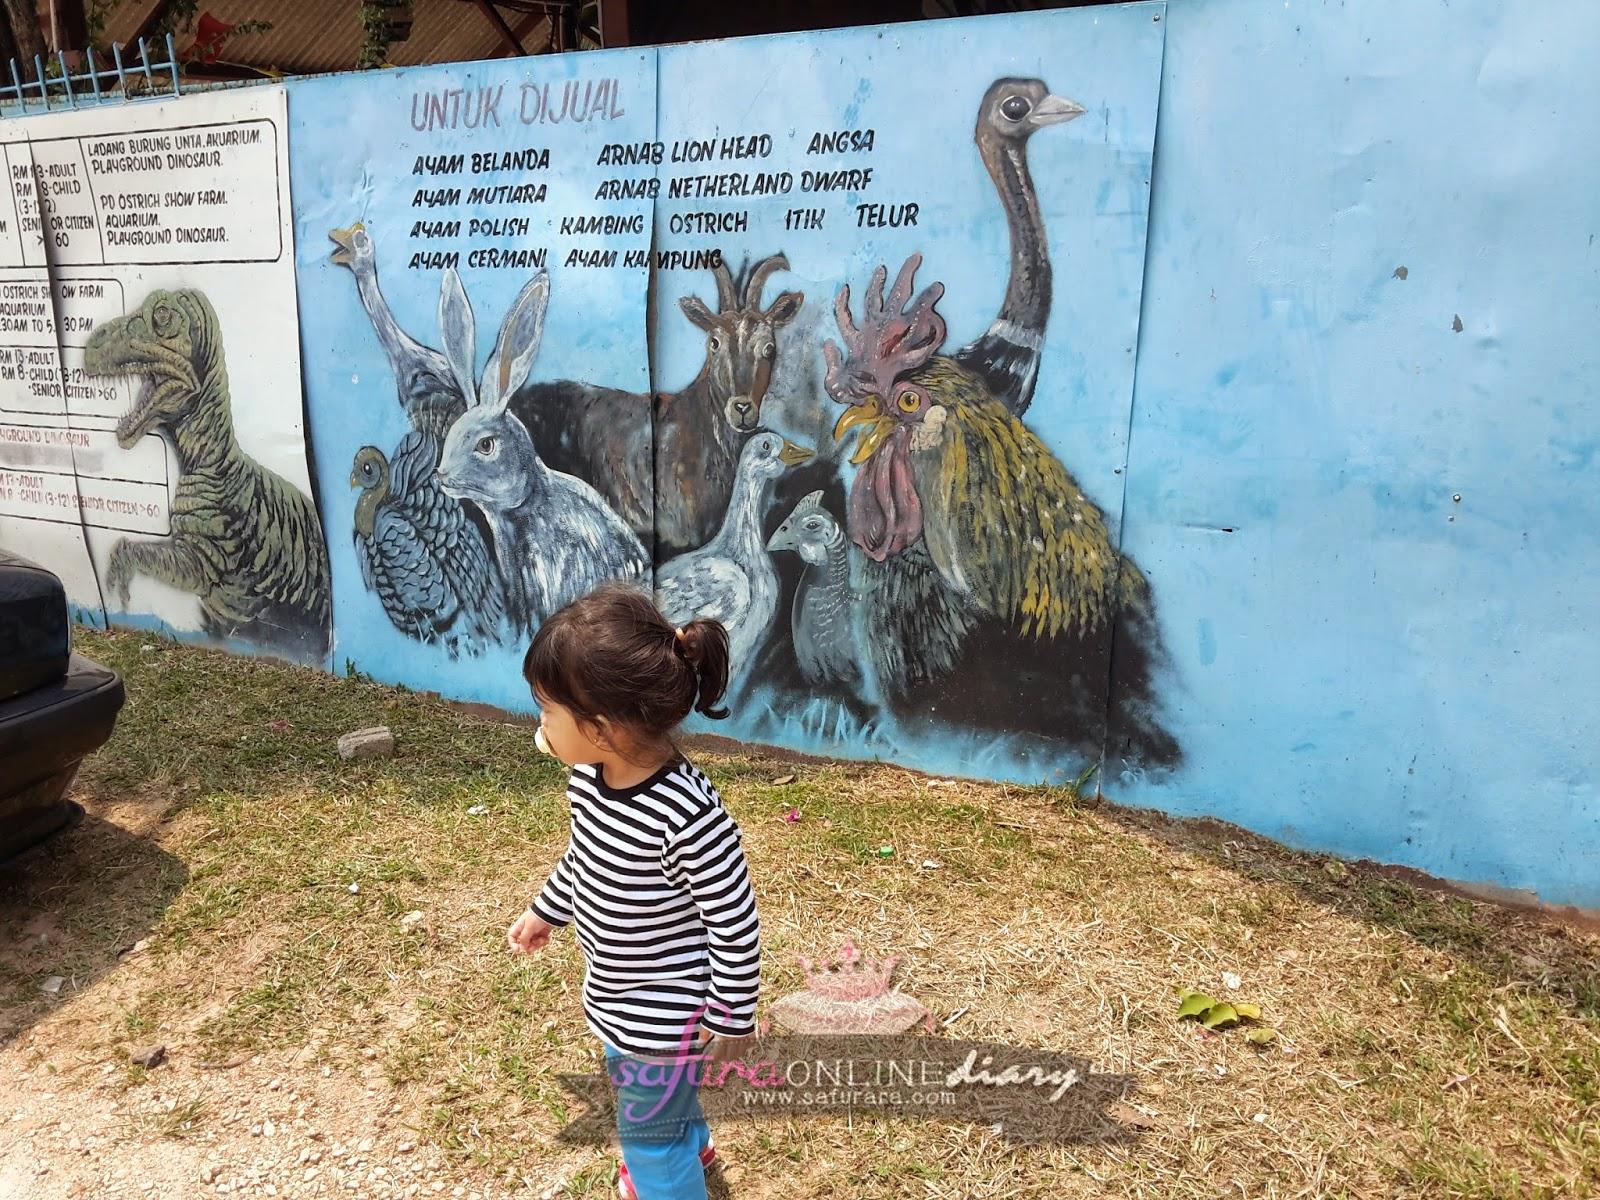 Harga Tiket Masuk Ostrich Farm Port Dickson 2014